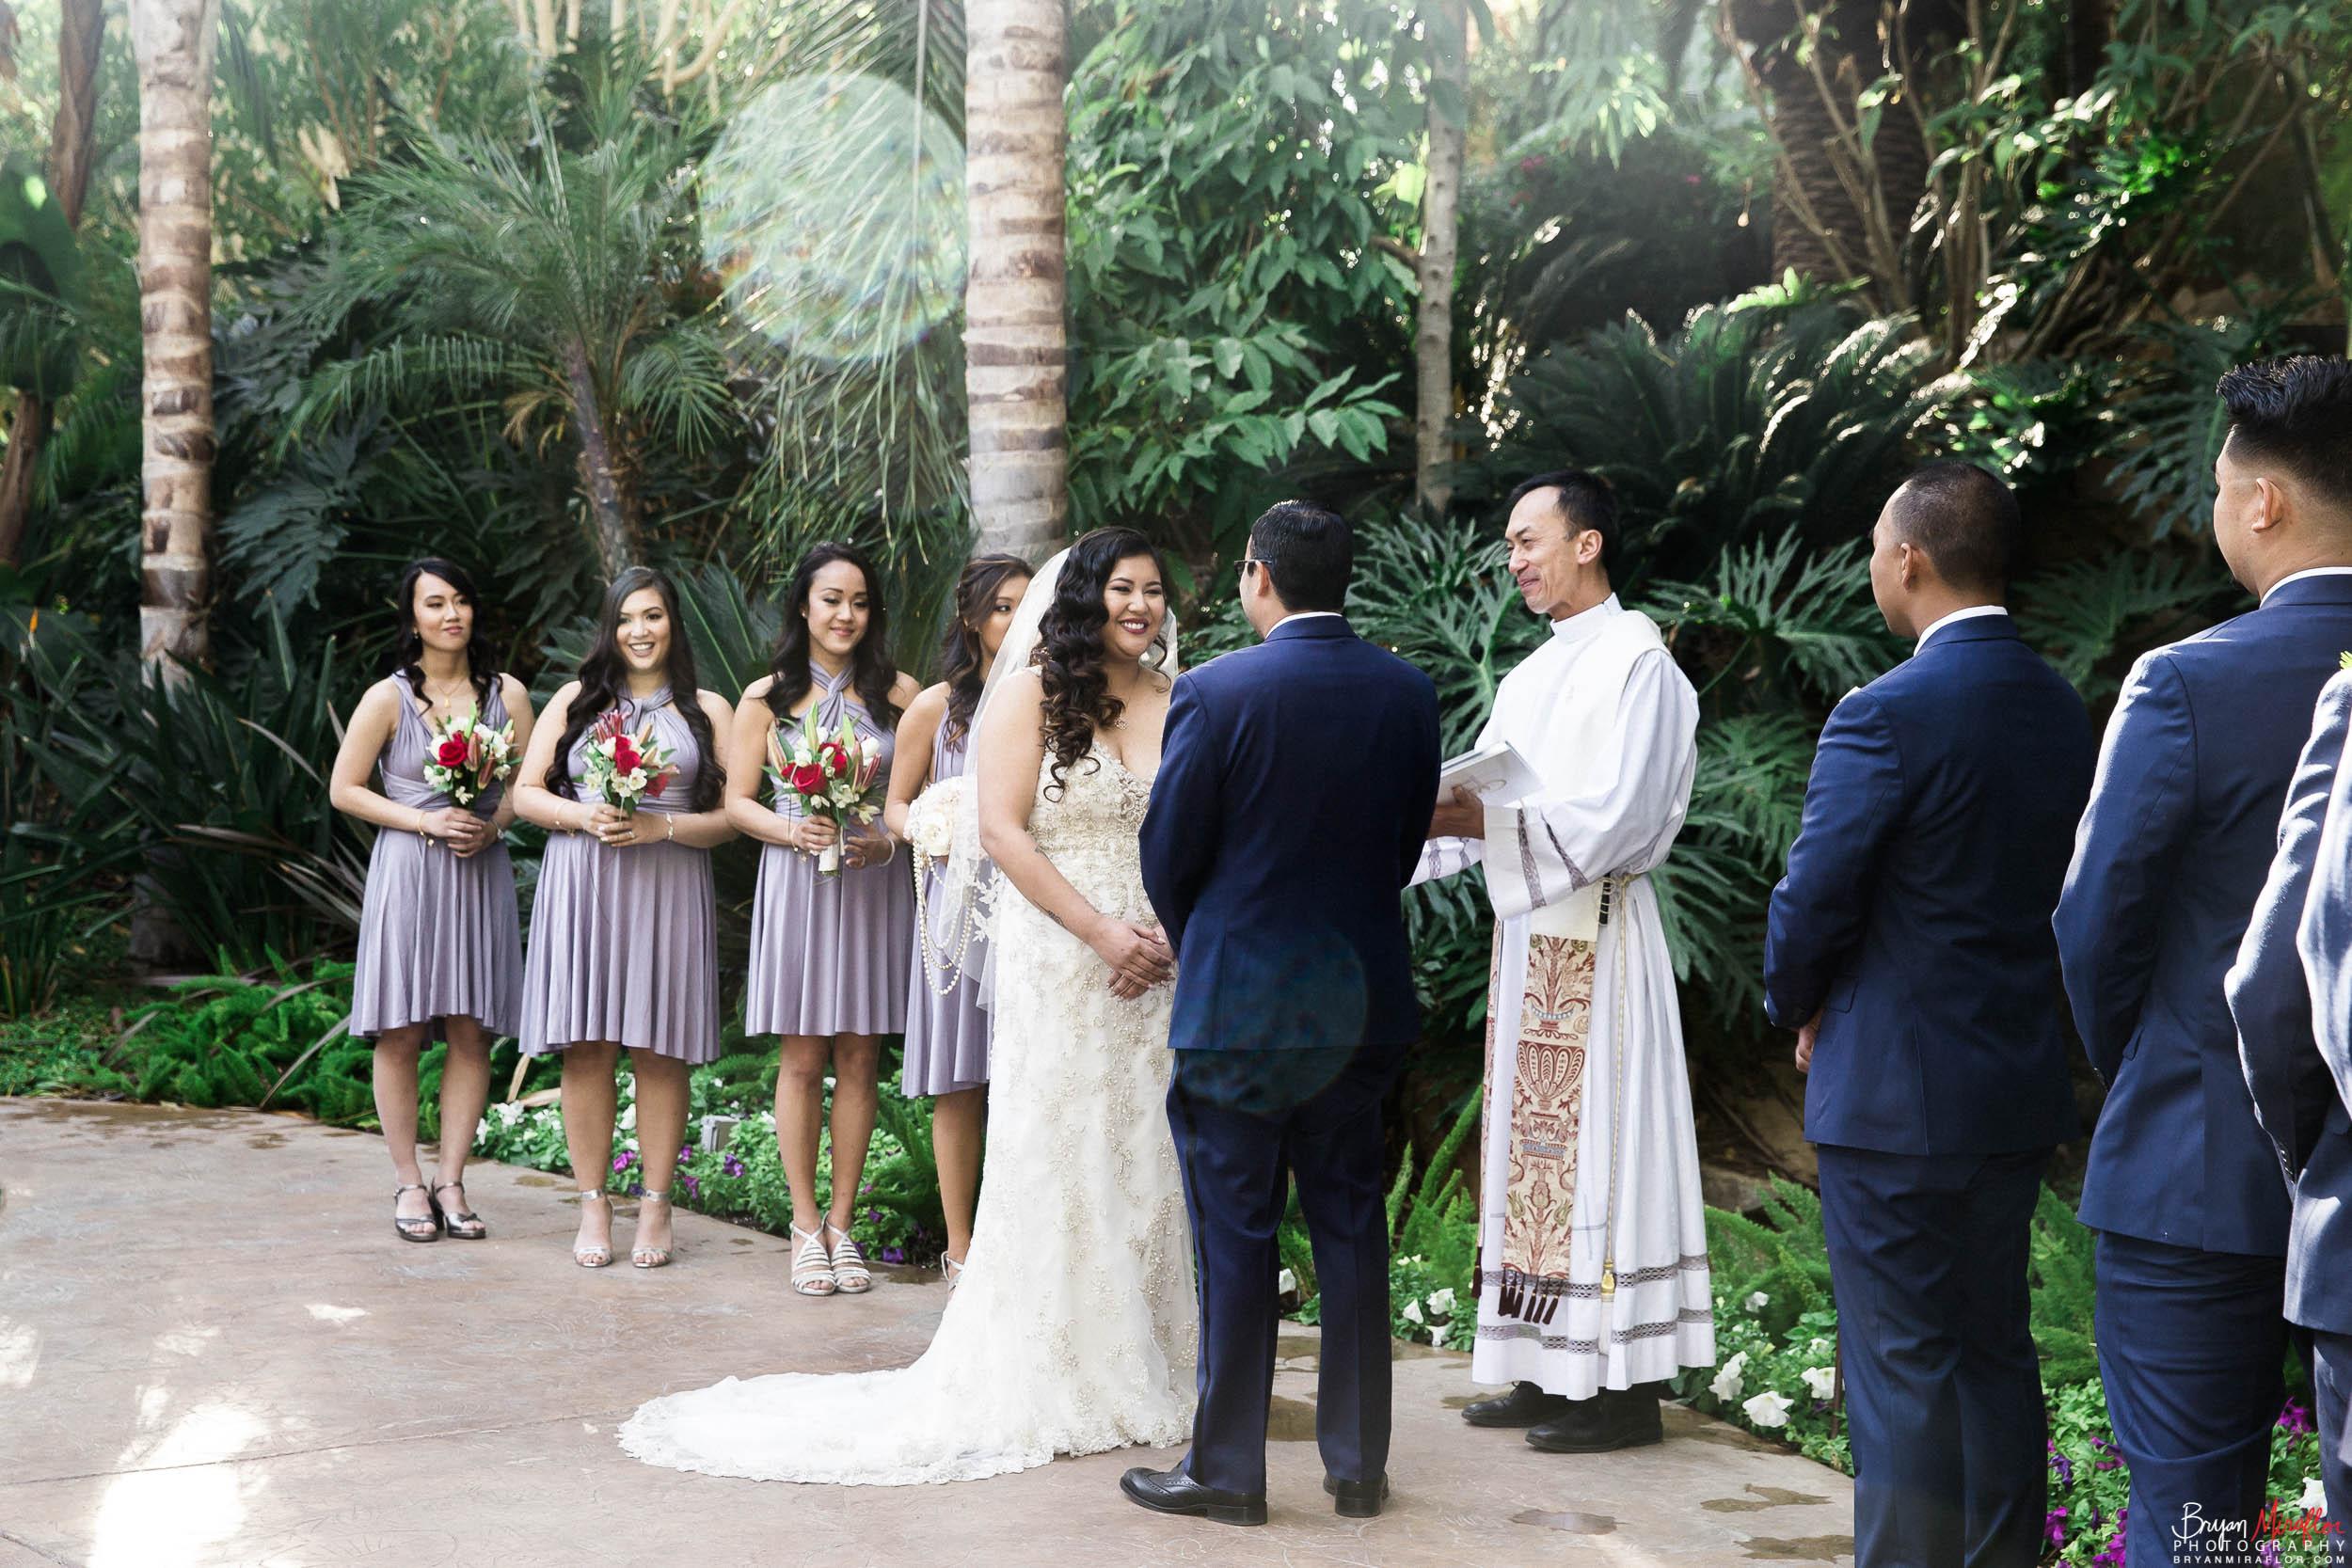 Bryan-Miraflor-Photography-Hannah-Jonathan-Married-Grand-Traditions-Estate-Gardens-Fallbrook-20171222-106.jpg